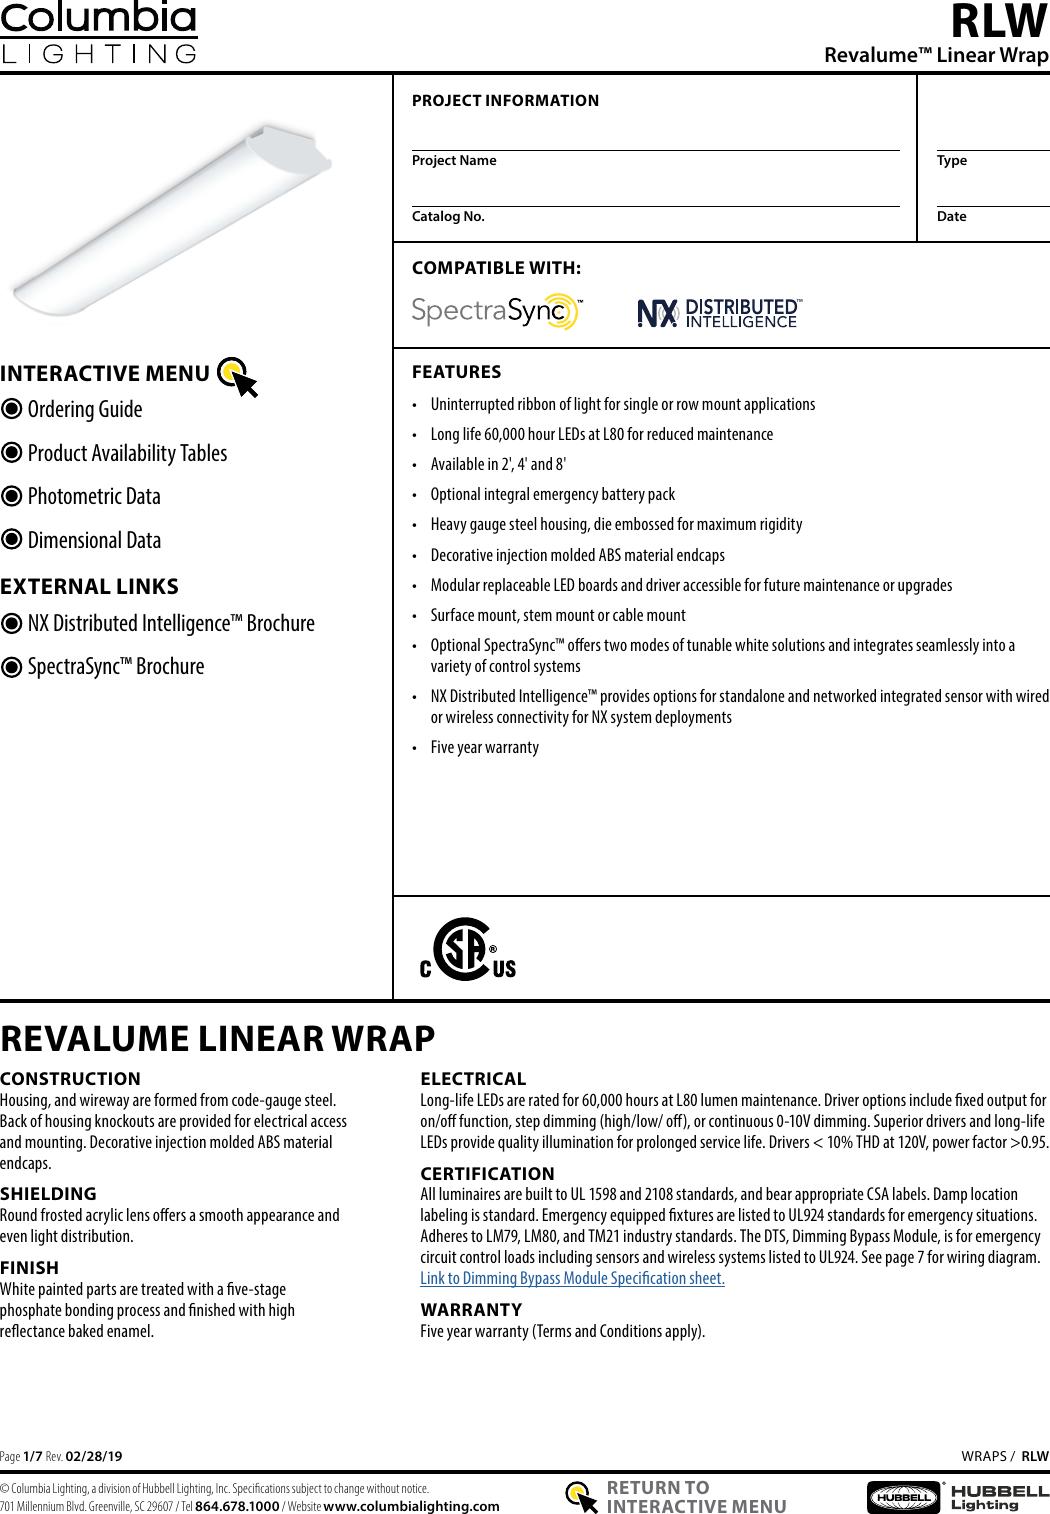 columbia step ballast wiring diagram col rlw spec  col rlw spec